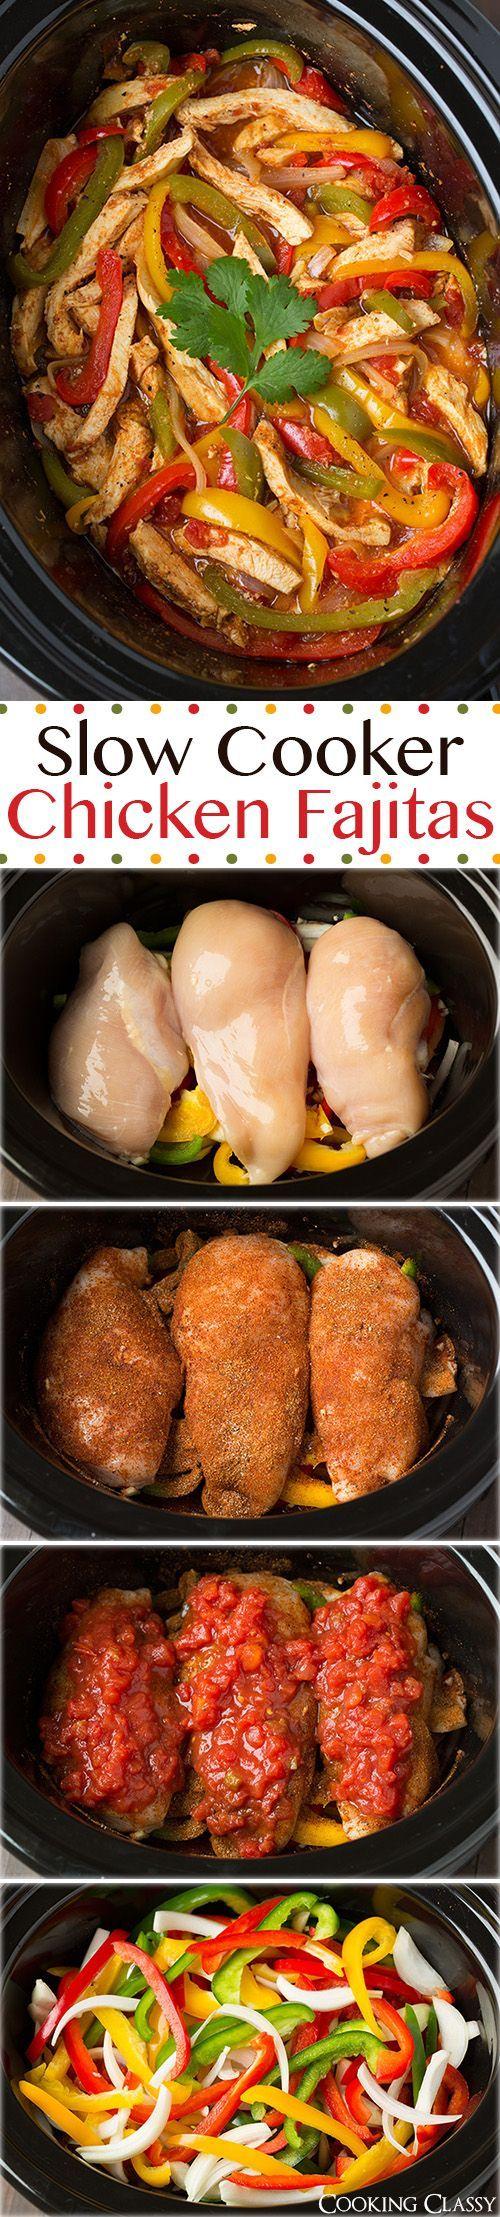 Clean Eating Slow Cooker Chicken Fajitas Recipe